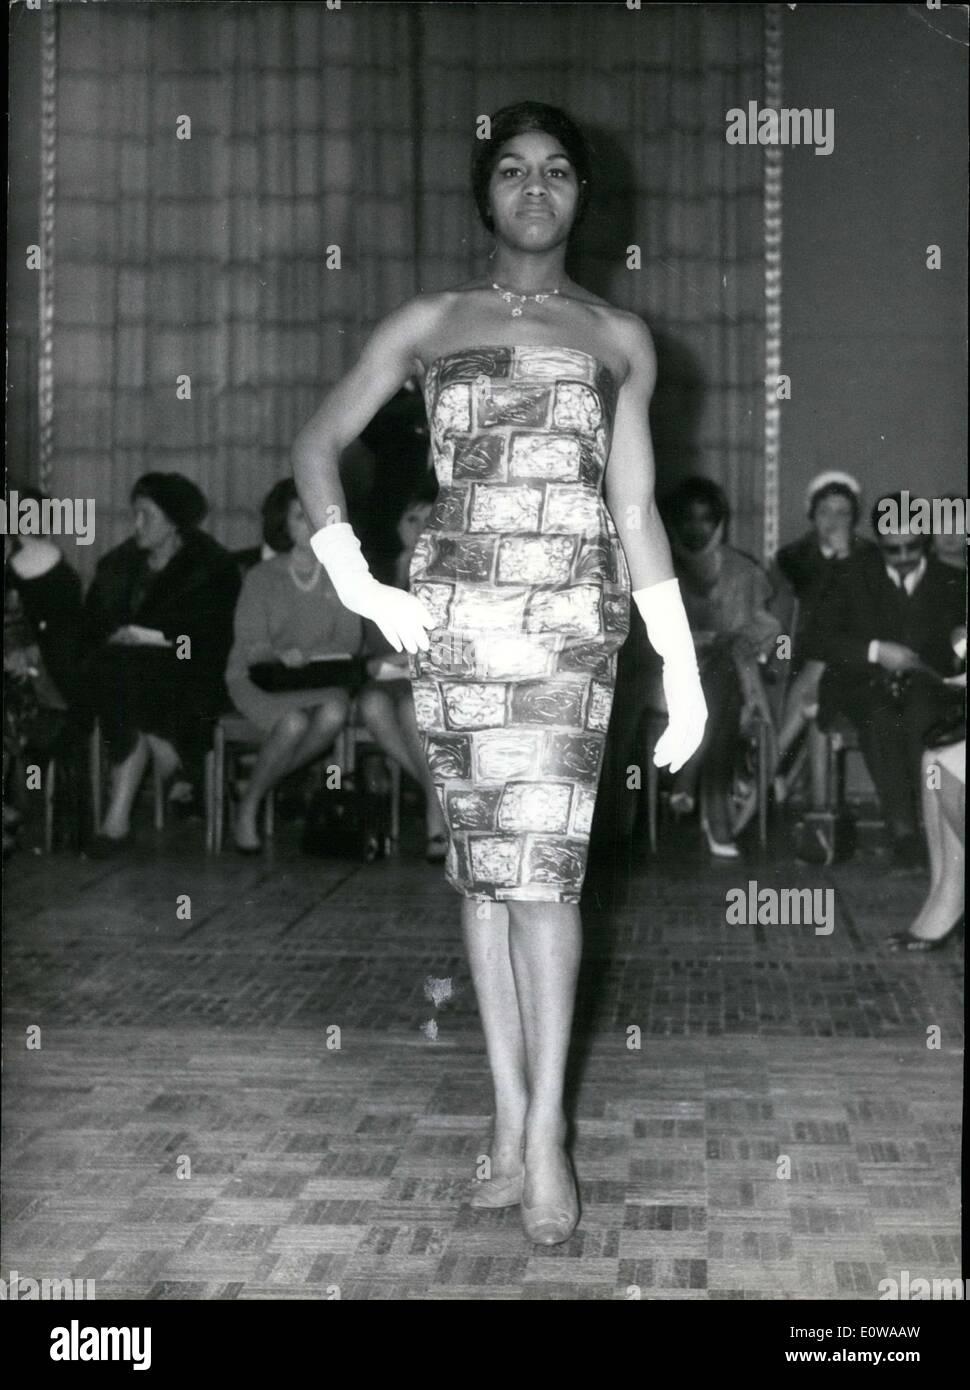 Black Models Archive Imágenes De Stock   Black Models Archive Fotos ... d49b70b4728